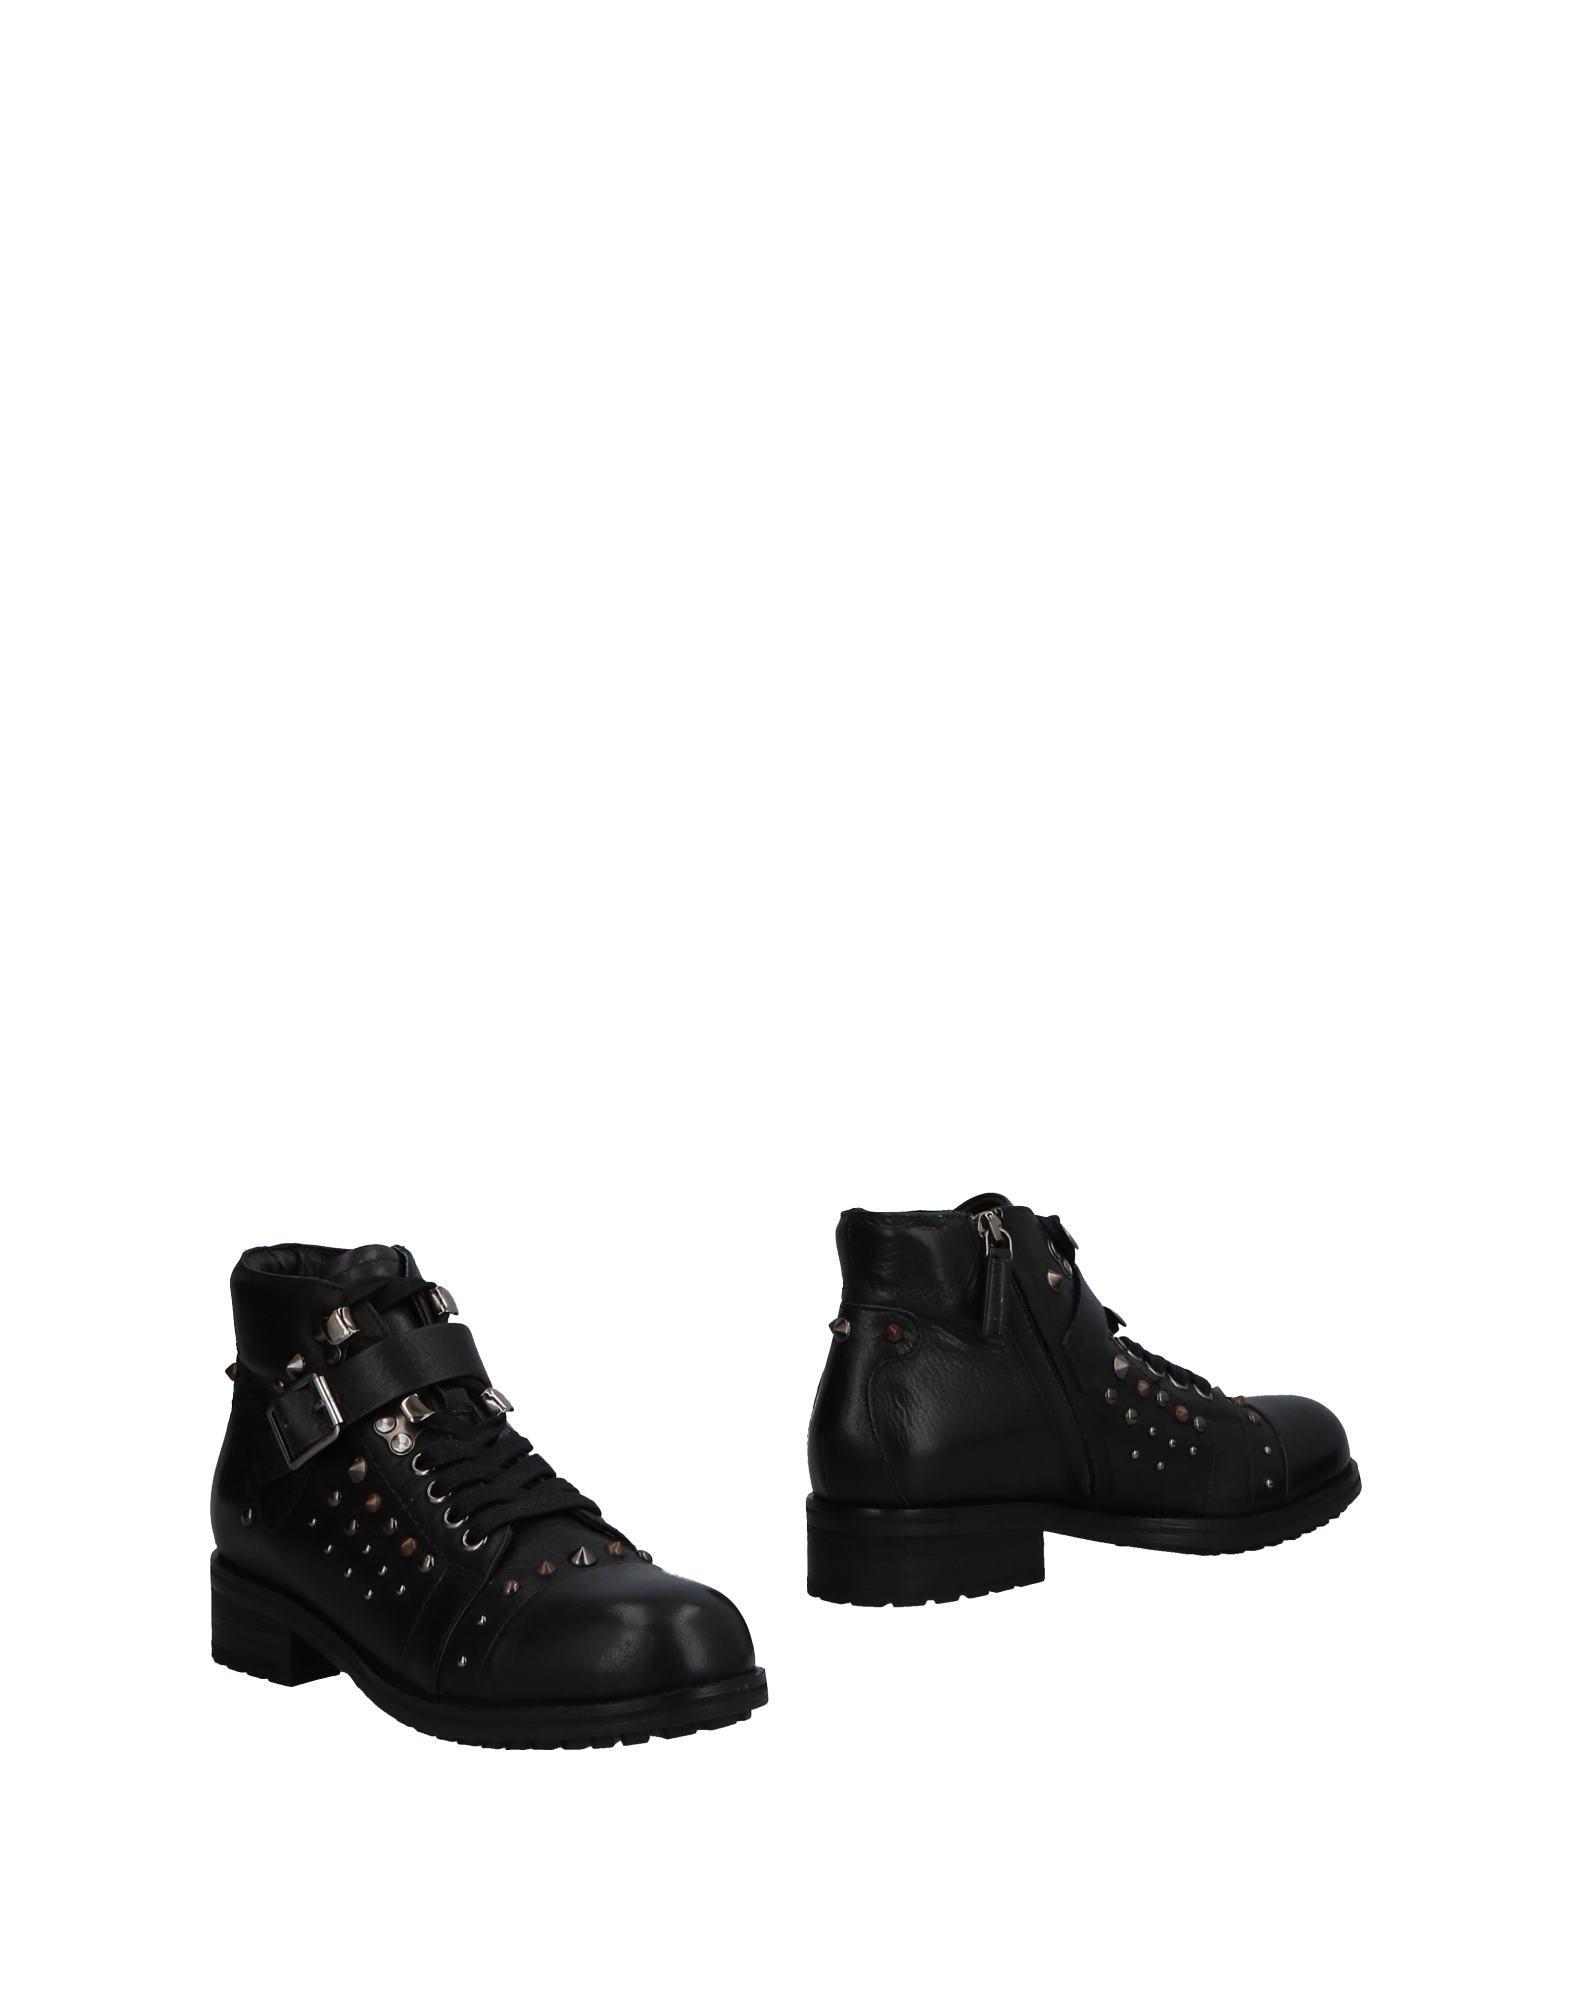 J|D Julie Dee Stiefelette Damen beliebte  11500460IV Gute Qualität beliebte Damen Schuhe acded3